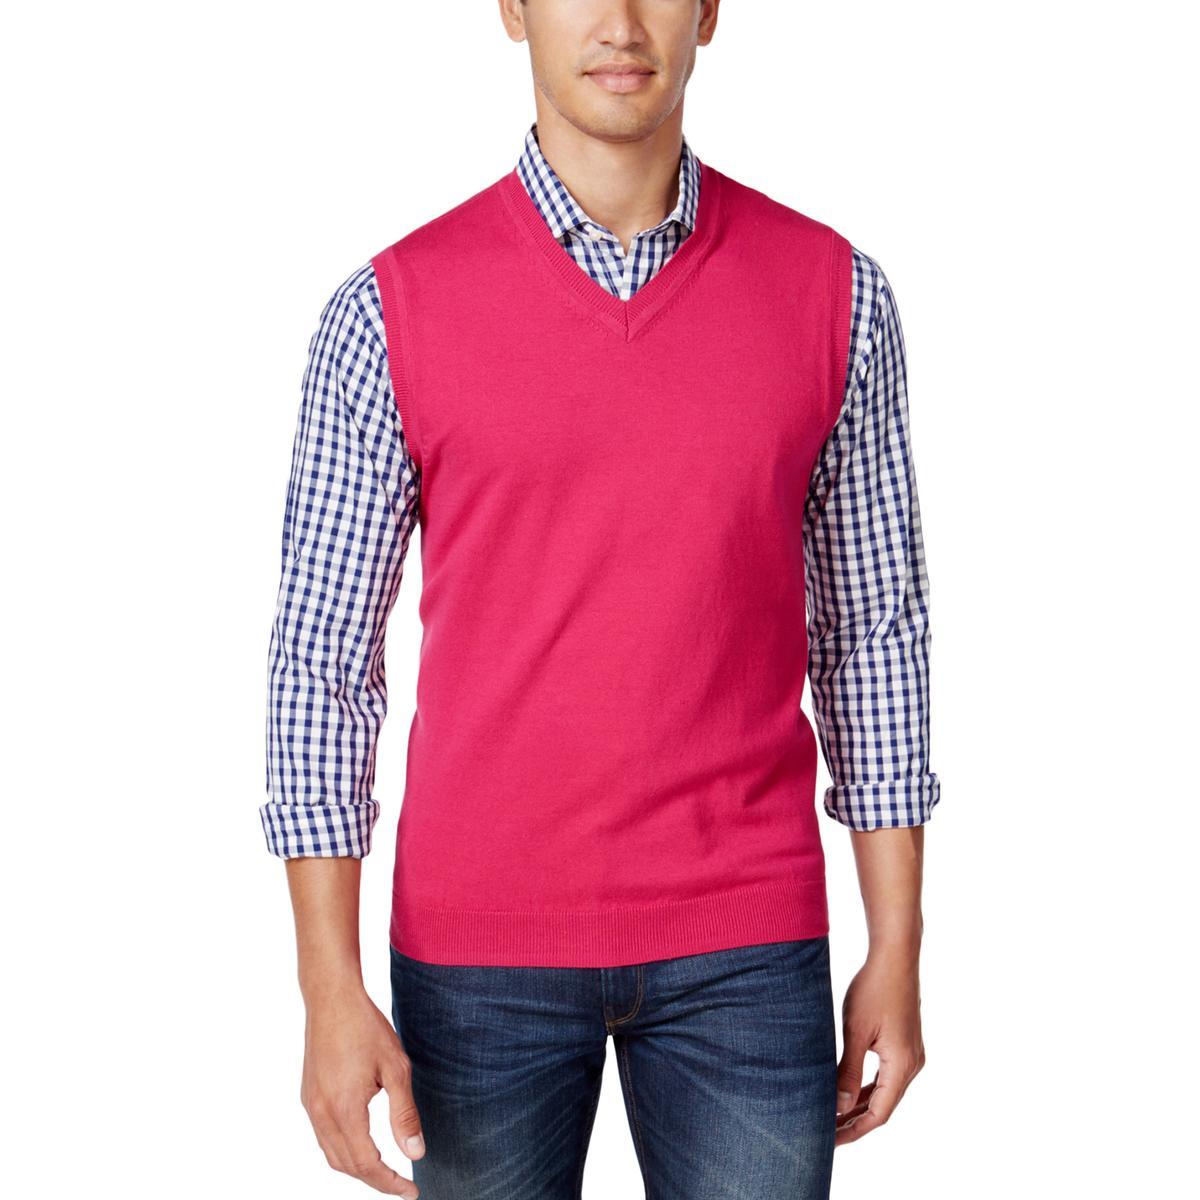 Club Room Men's Black Sleeveless V Neck Sweater Vest Wool Size 2xb ...